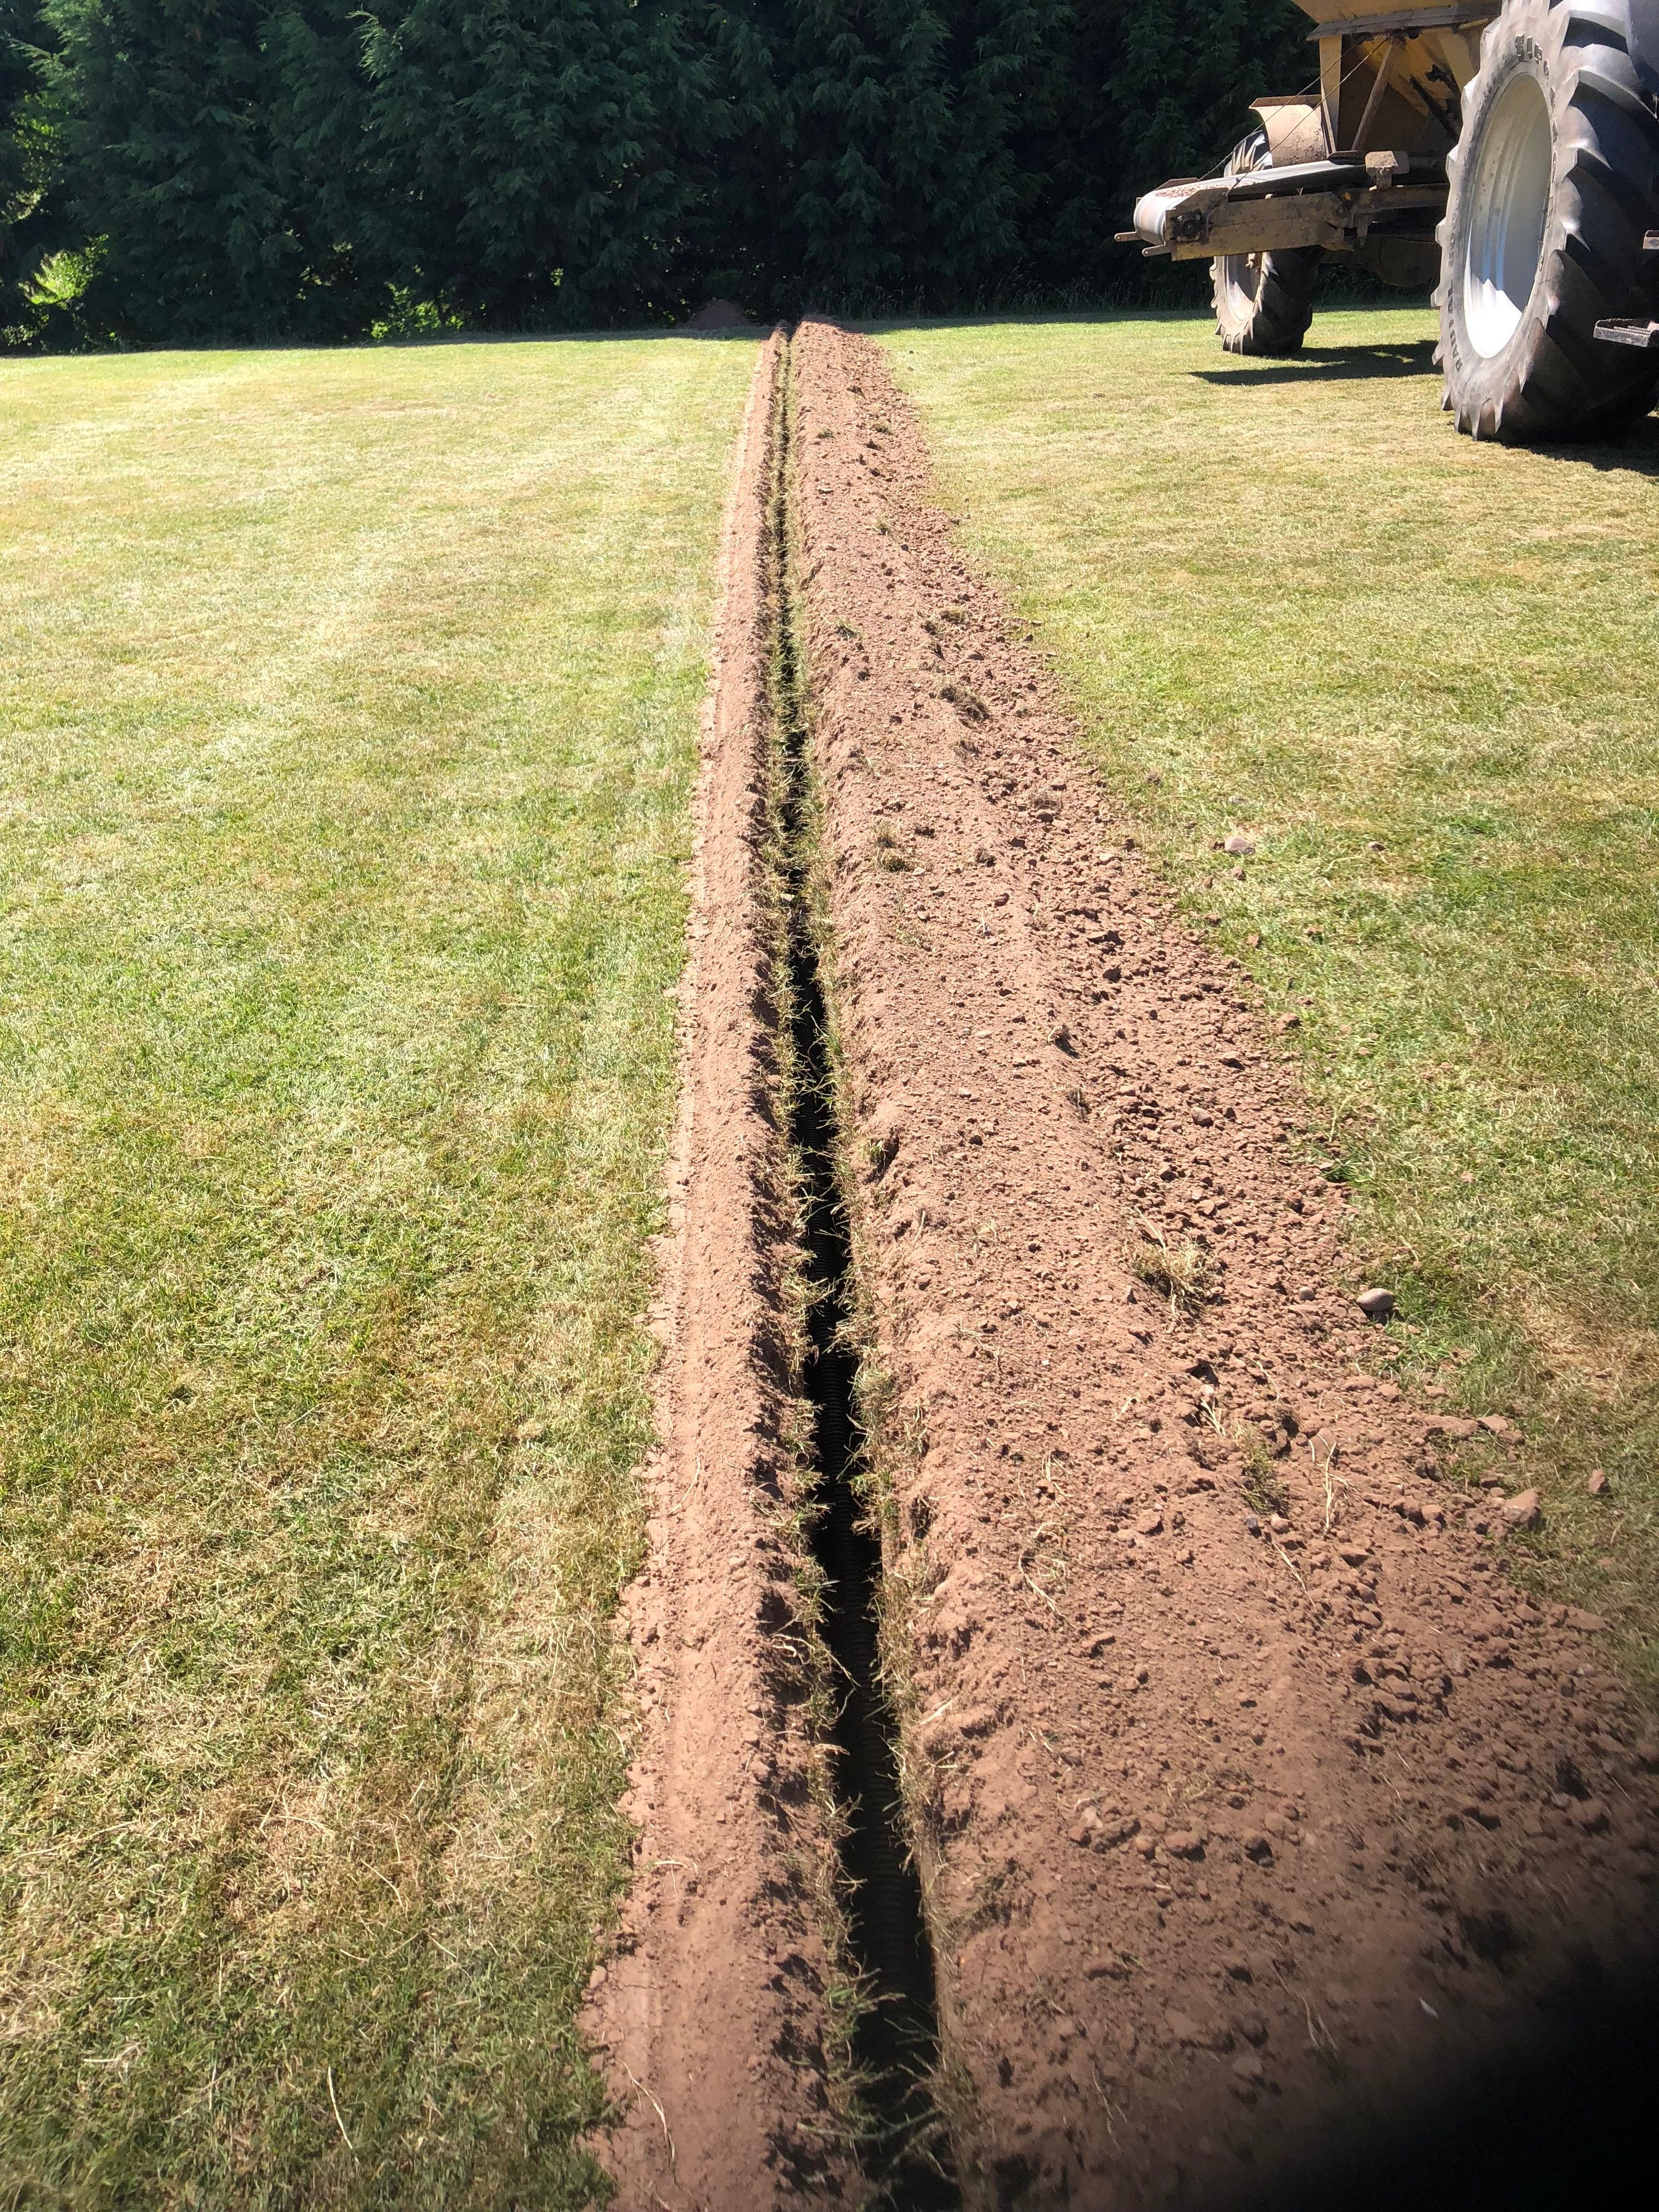 Narrow trench dug